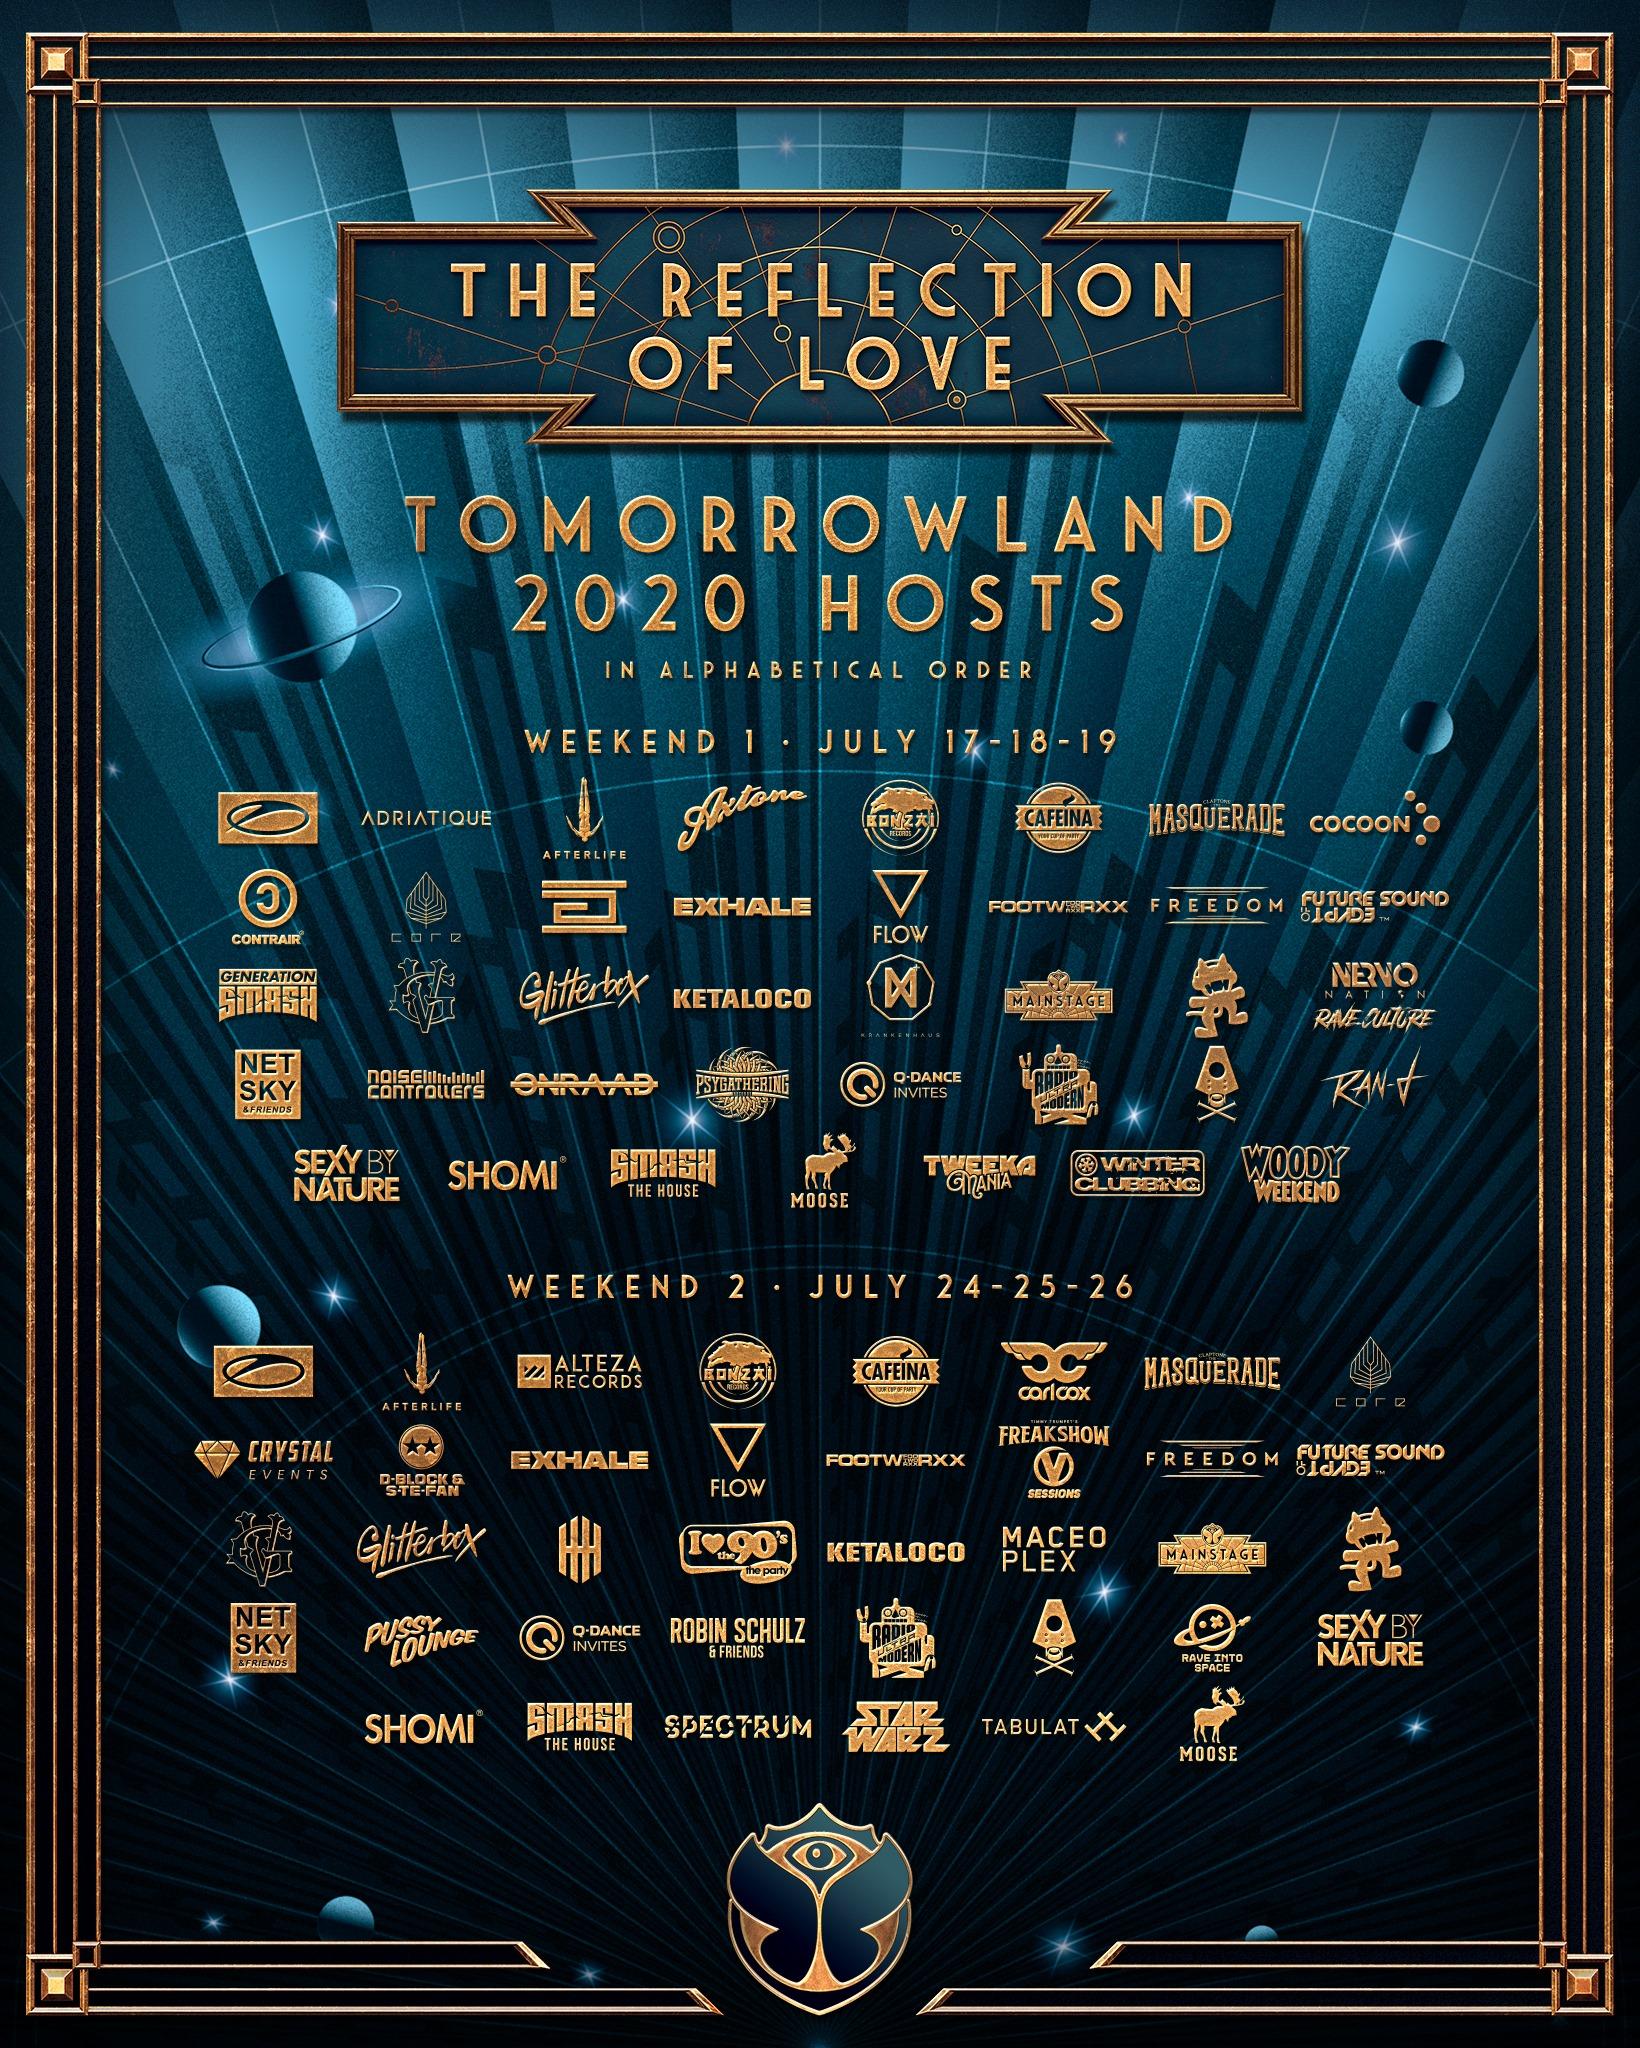 Tomorrowland 2020 Stage Hosts